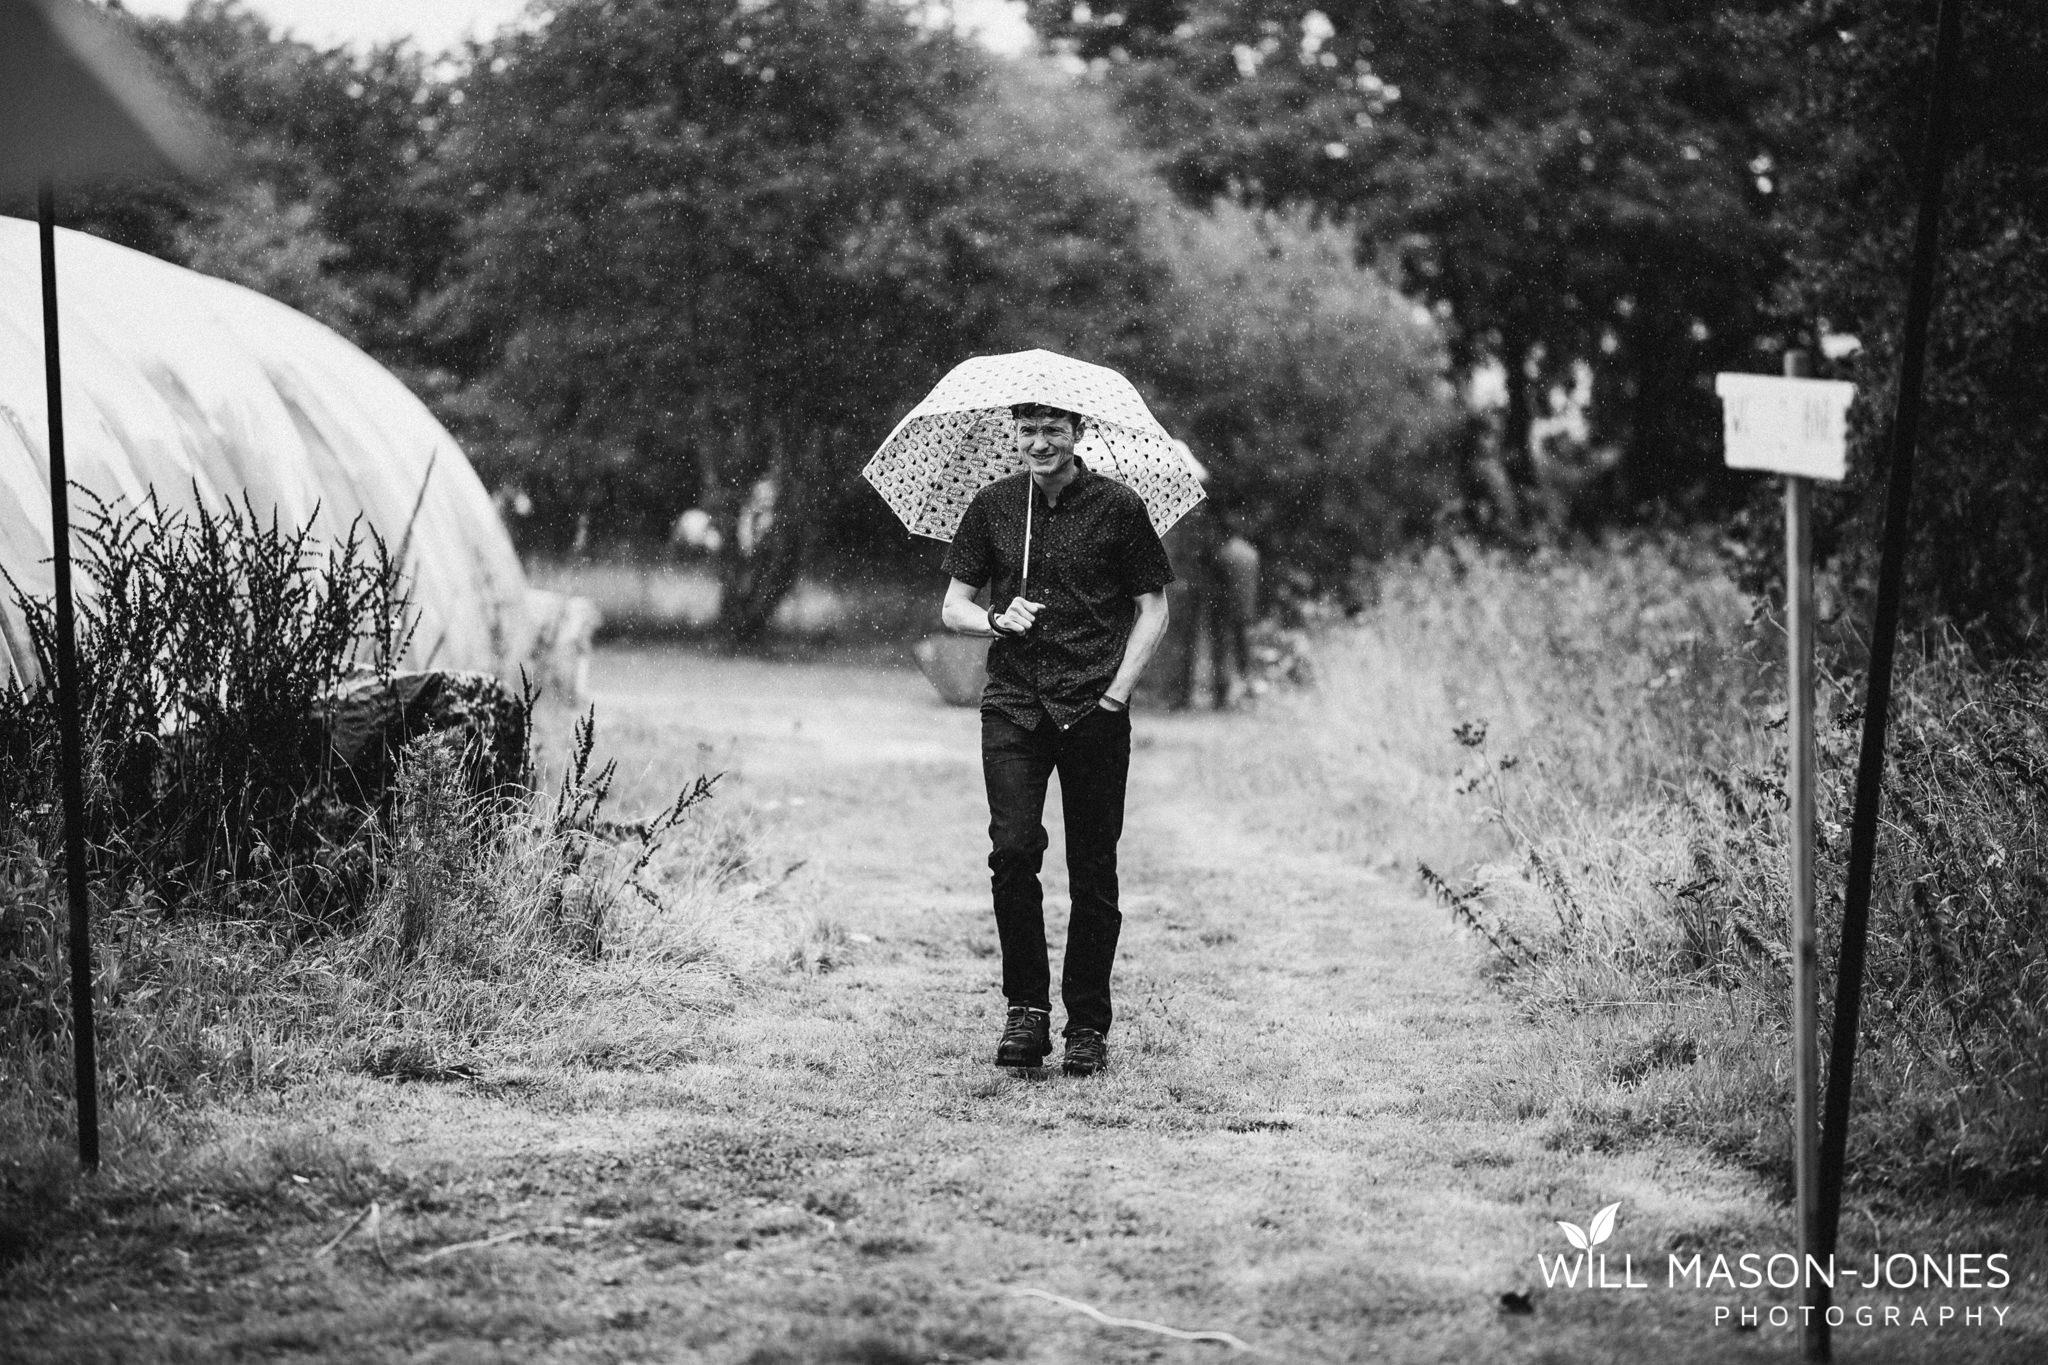 outdoor-wet-rainy-wedding-uk-swansea-photography-21.jpg